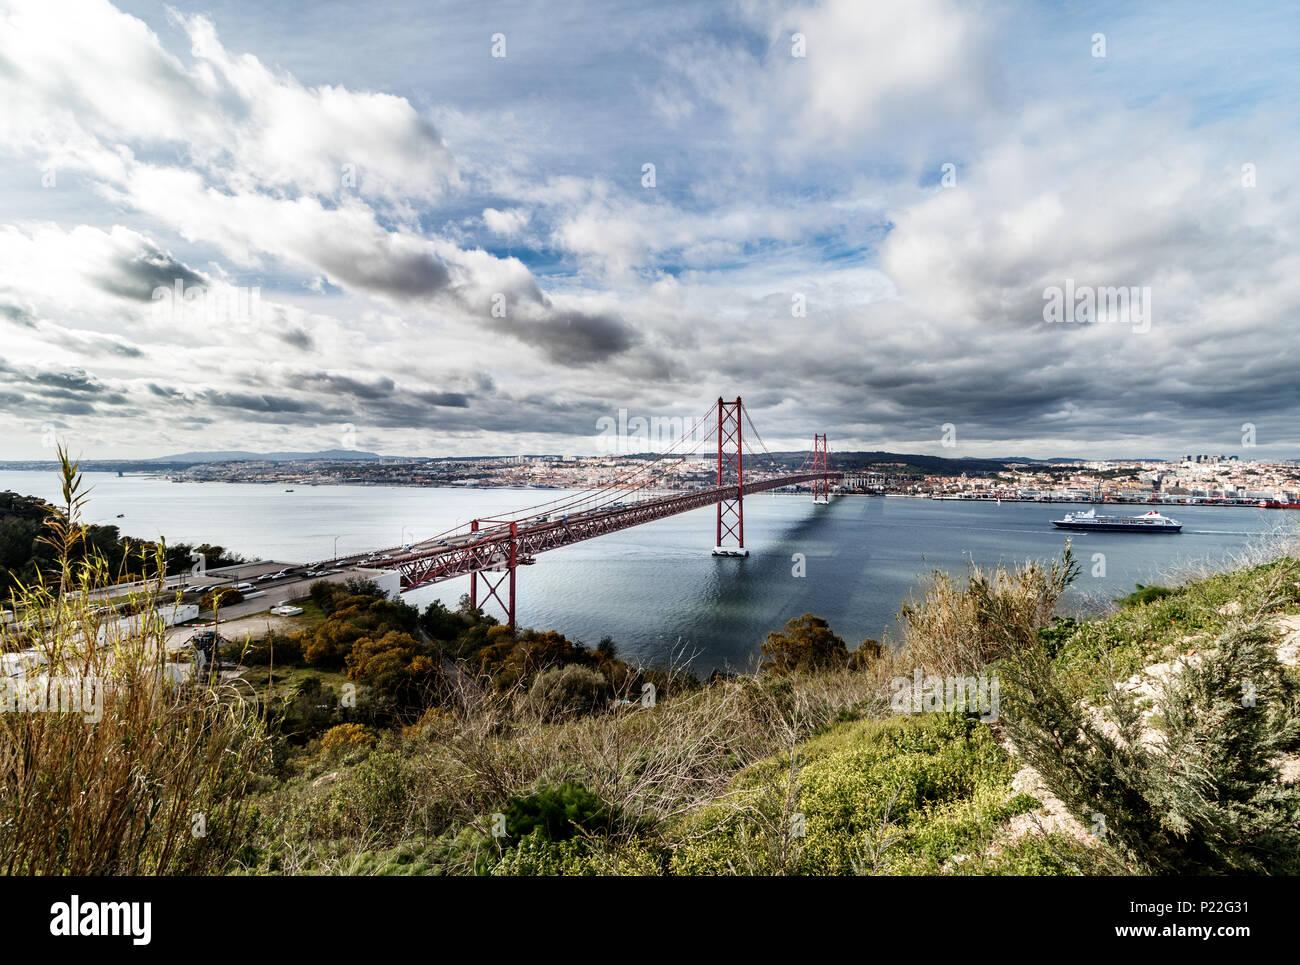 lisboa bridge view Ponte 25 de Abril Stock Photo